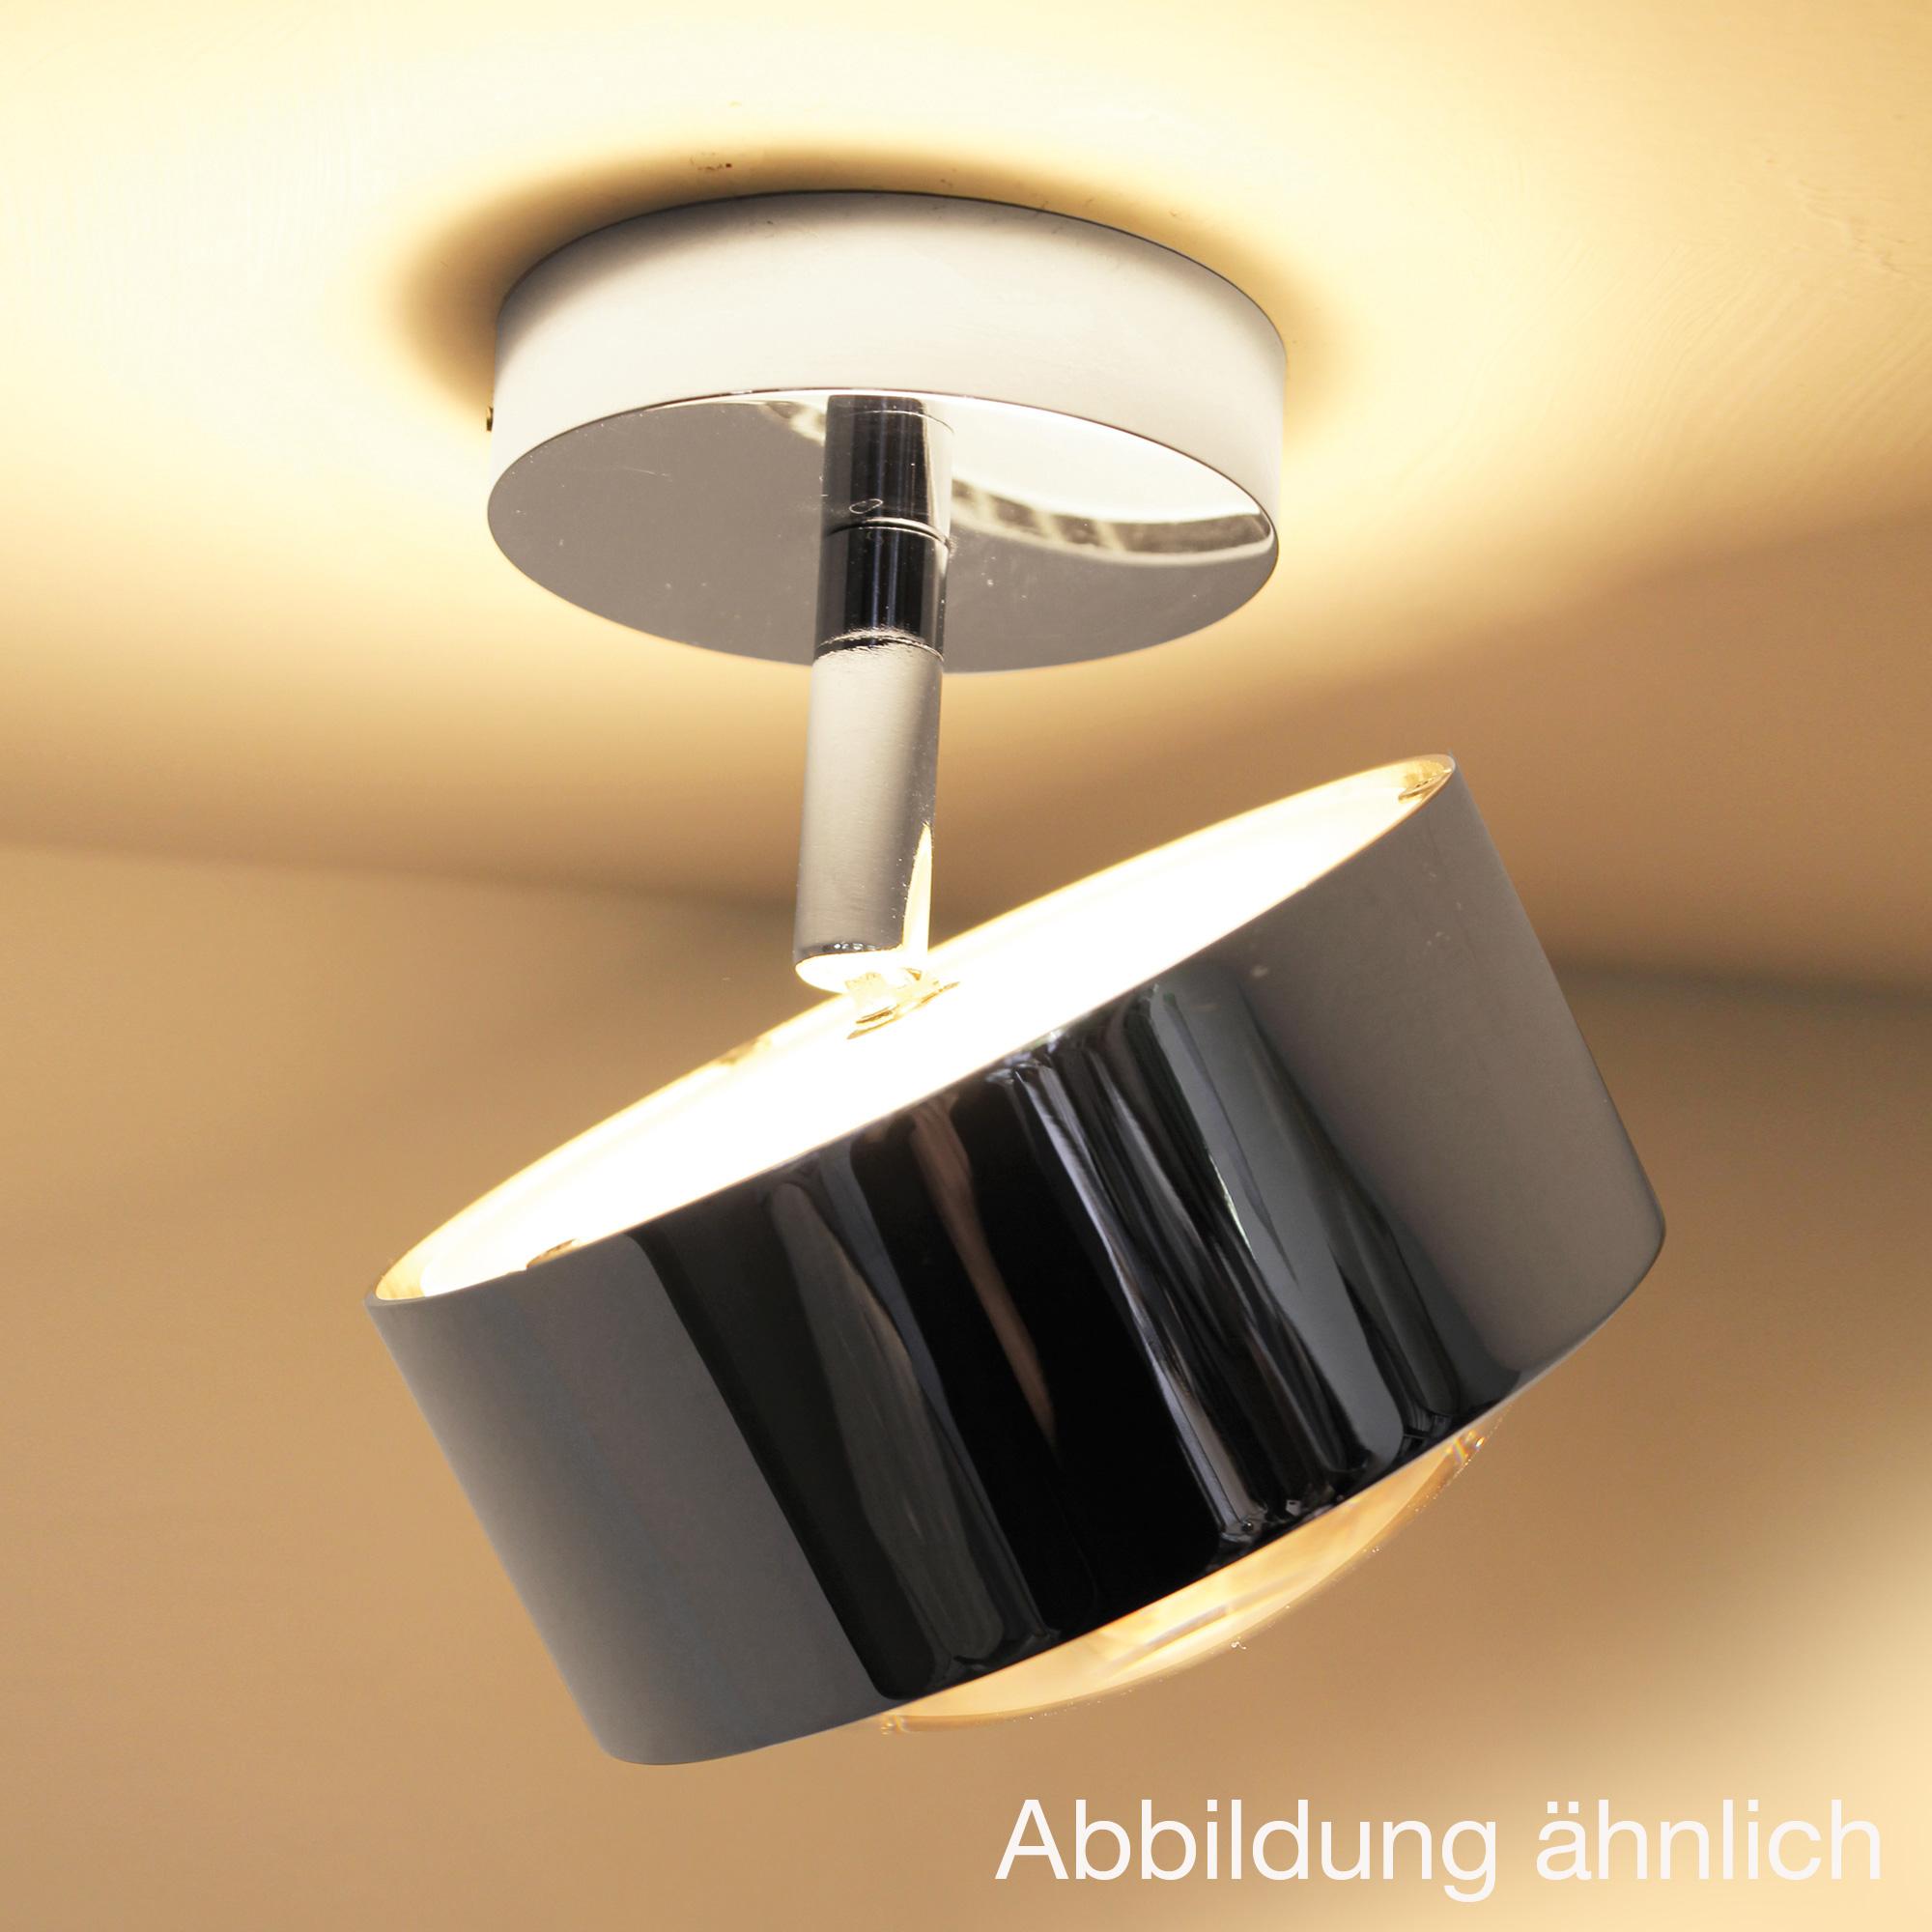 top light puk maxx turn up downlight led deckenleuchte 2 3038001 reuter onlineshop. Black Bedroom Furniture Sets. Home Design Ideas